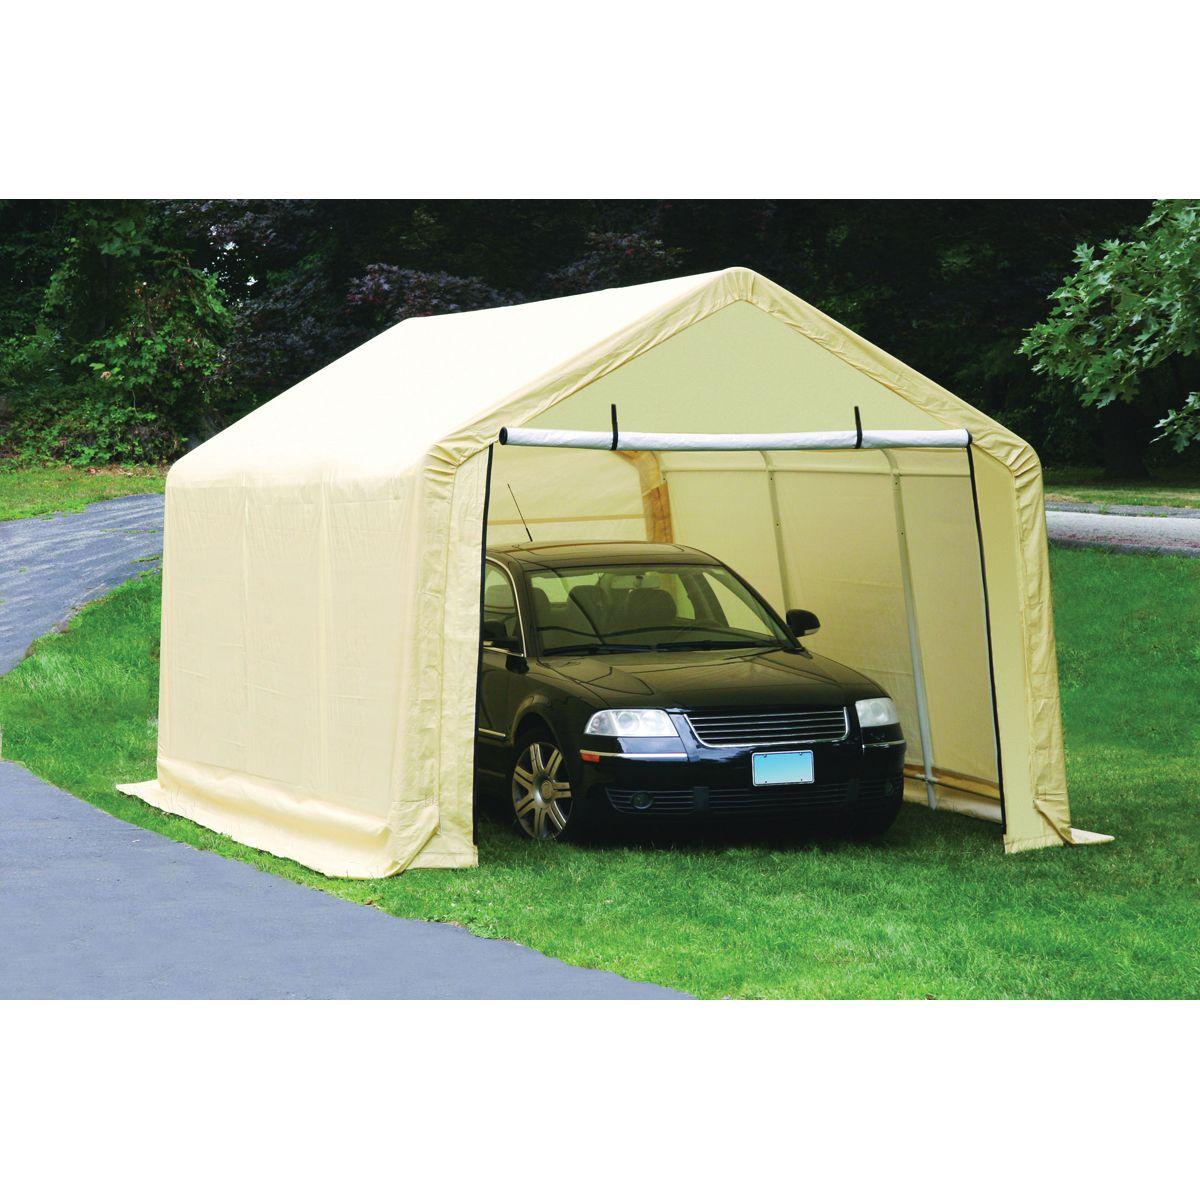 10 ft. x 17 ft. Portable Garage Portable garage